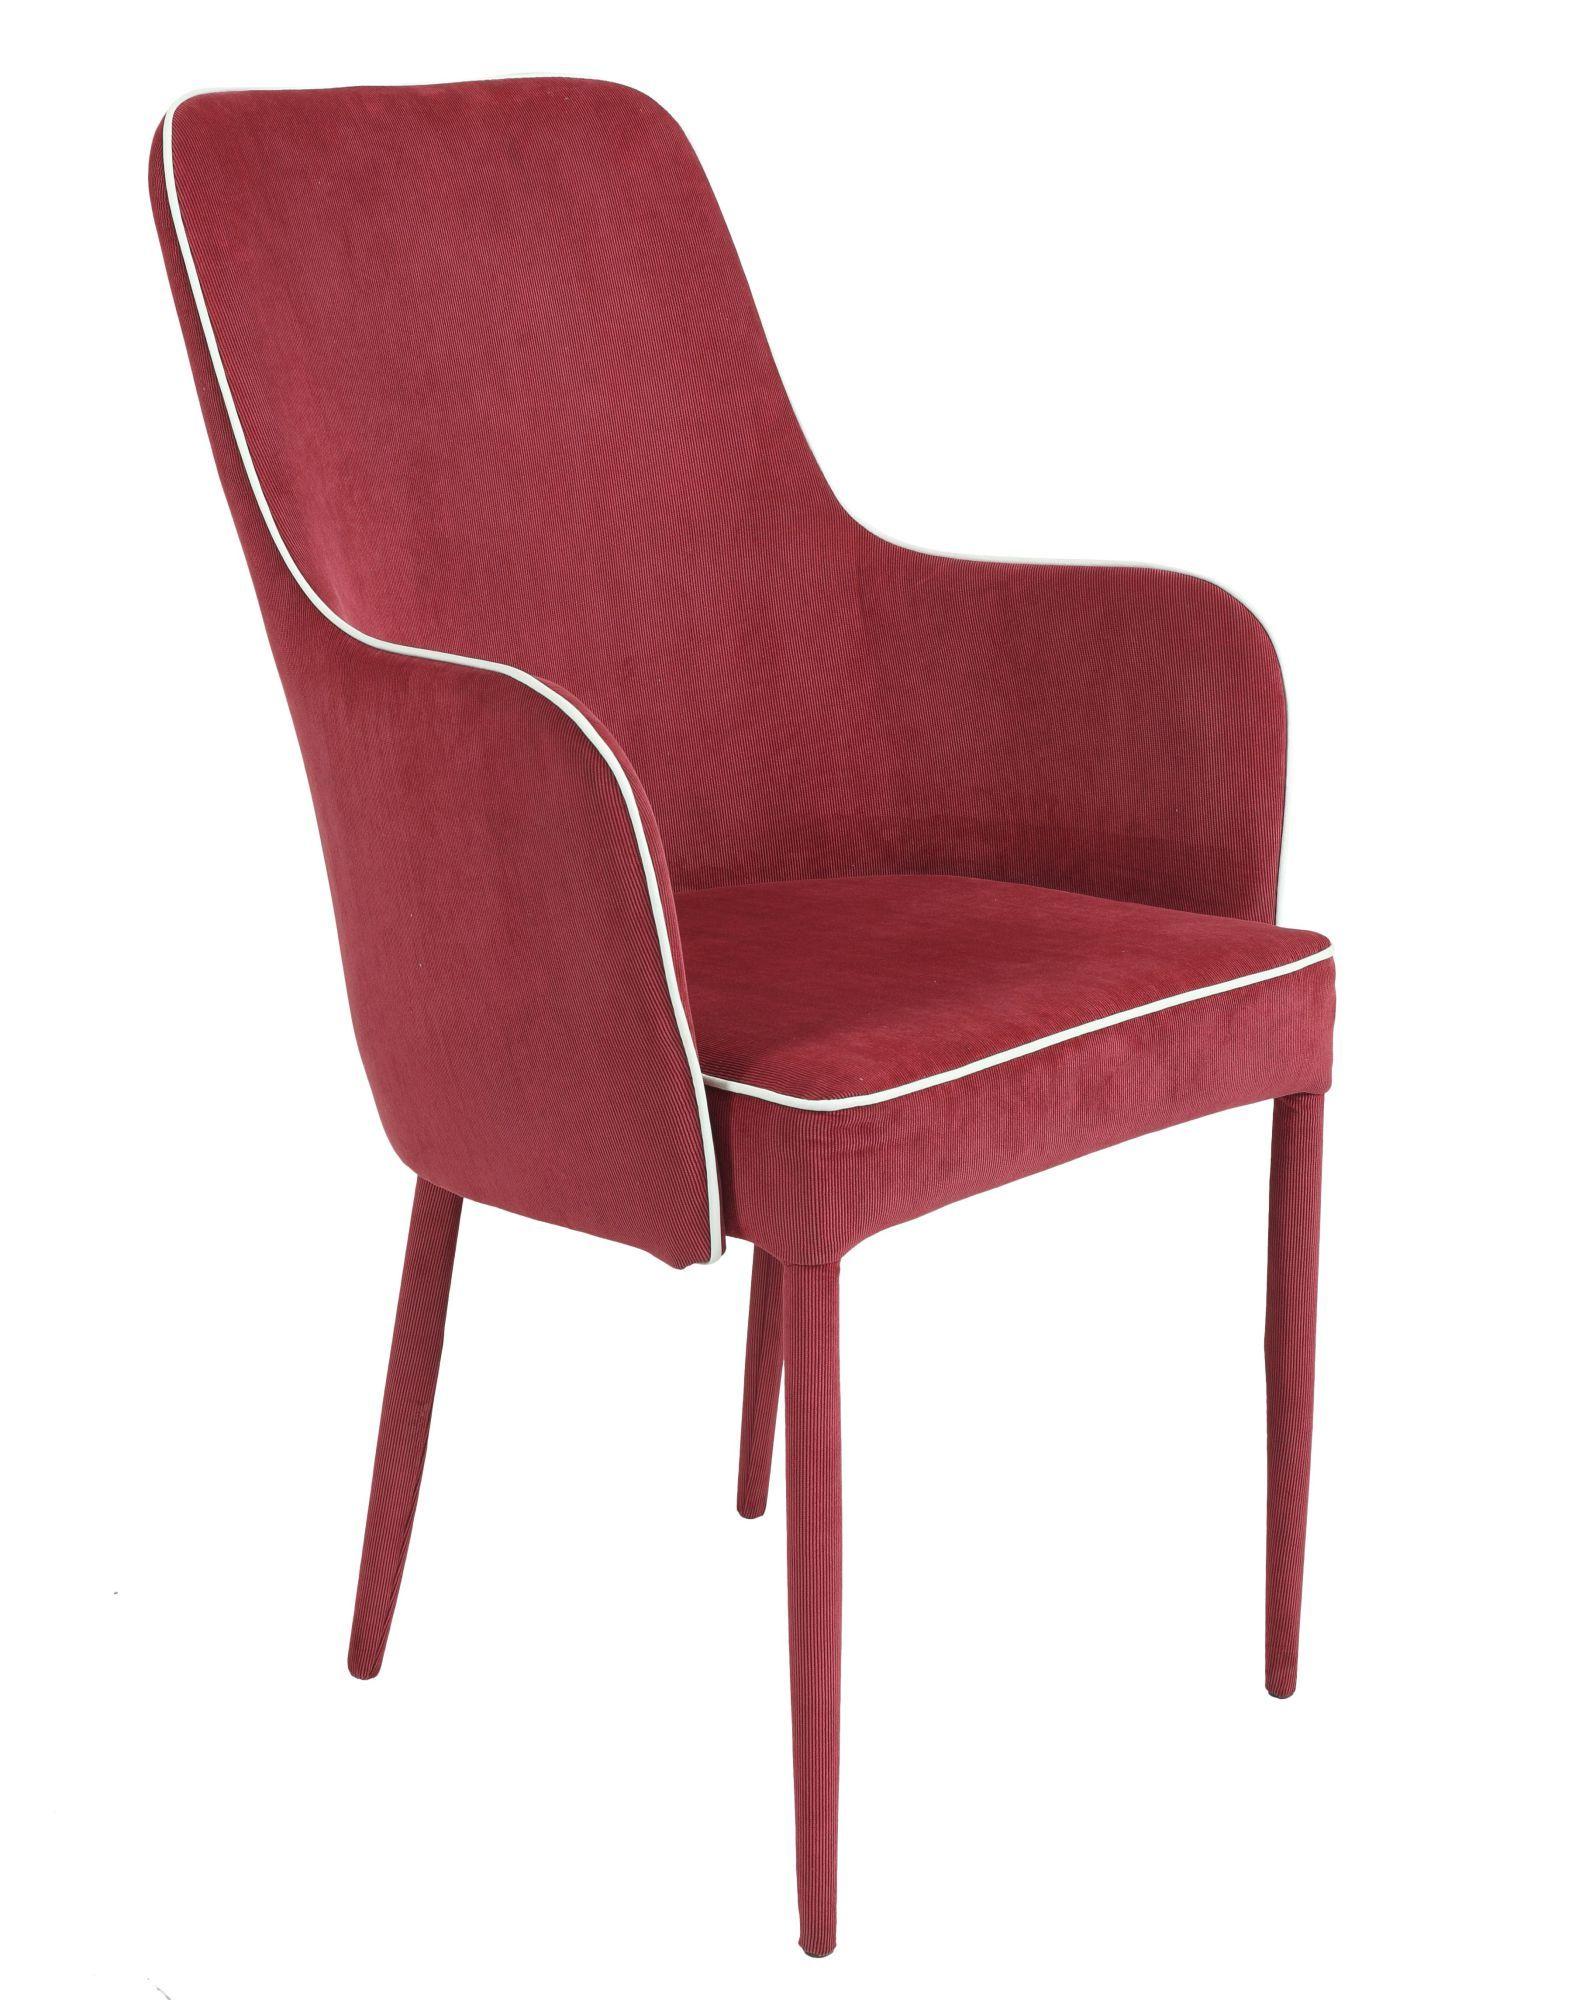 Jedálenská stolička / kreslo AMBRA - SCONTO NÁBYTOK-moderný dizajn s ...